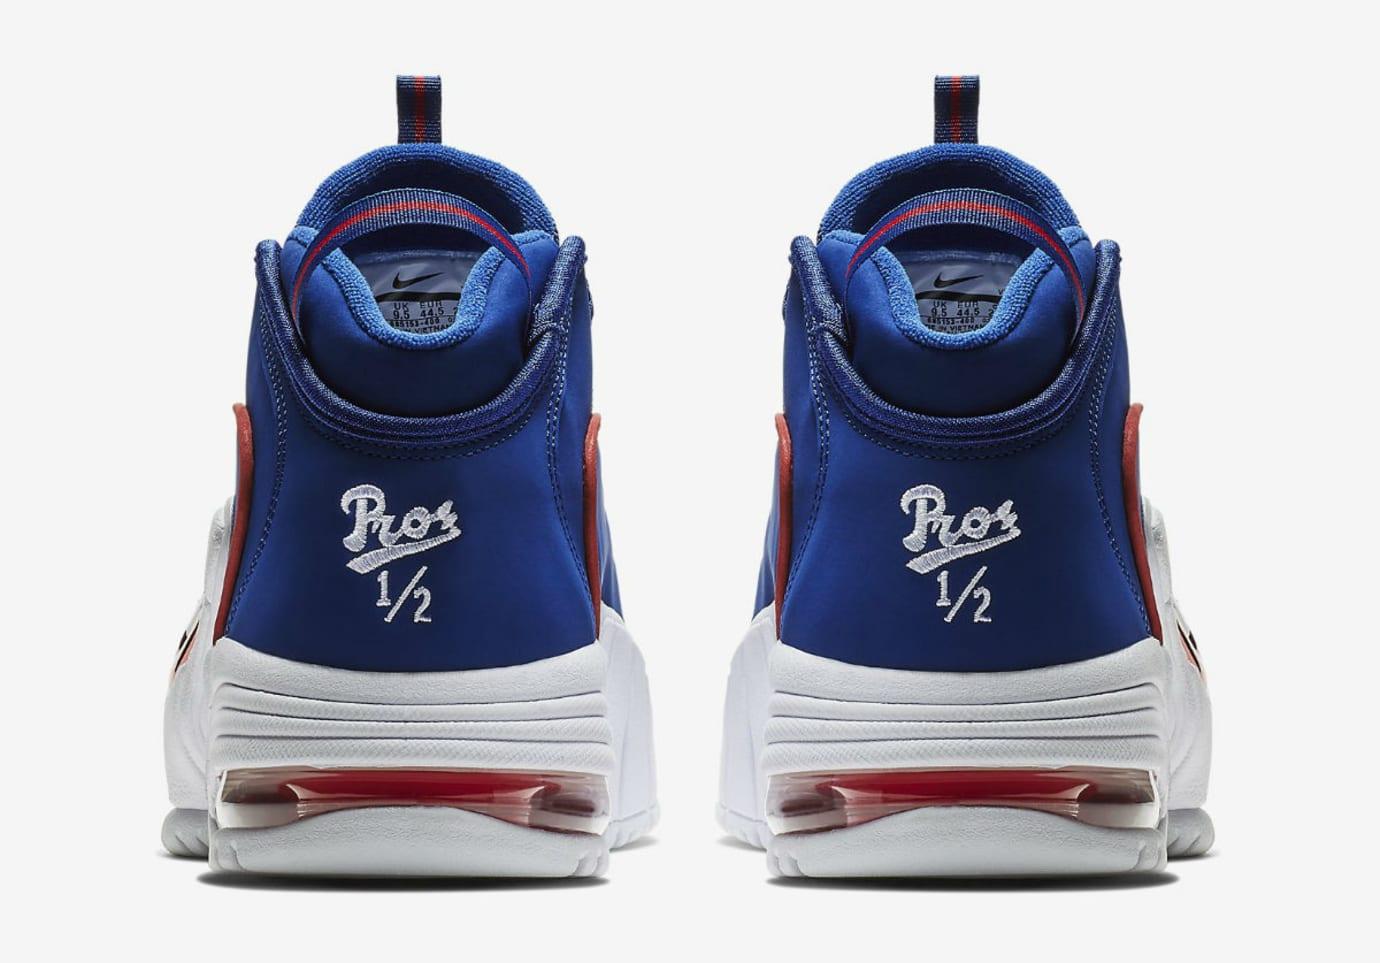 hot sale online aae39 de909 Nike Air Max Penny 1 Lil Penny Release Date 685153-400 Heel